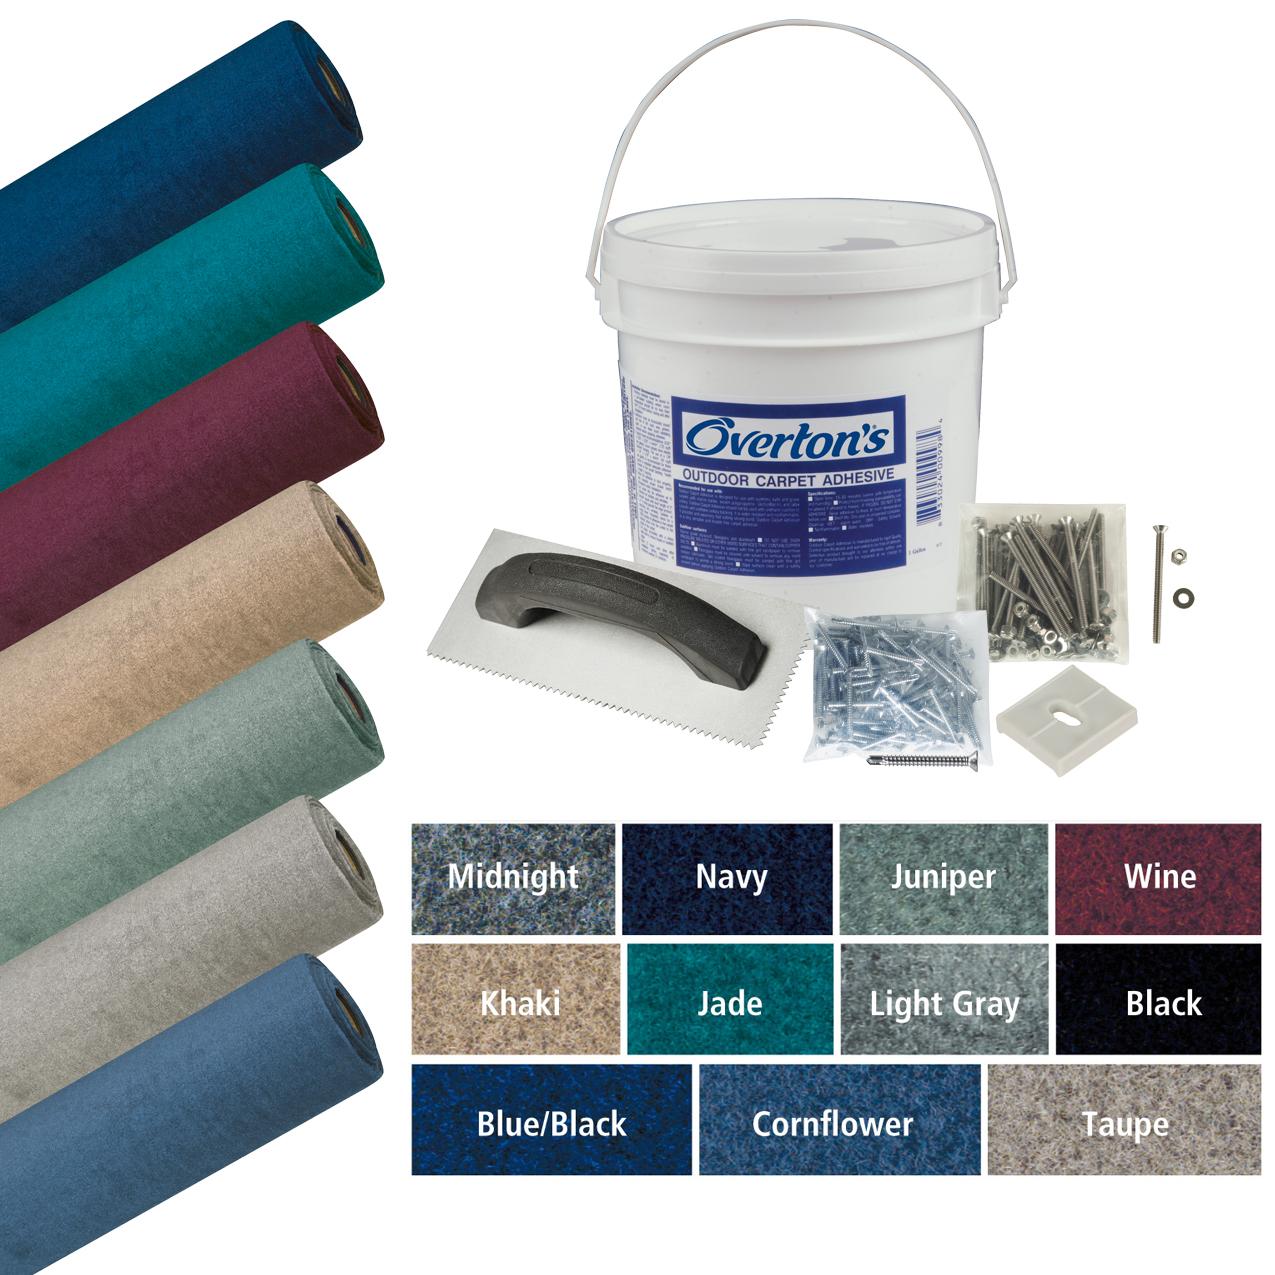 Overton's Malibu Carpet Kit, 8.5'W x 25'L